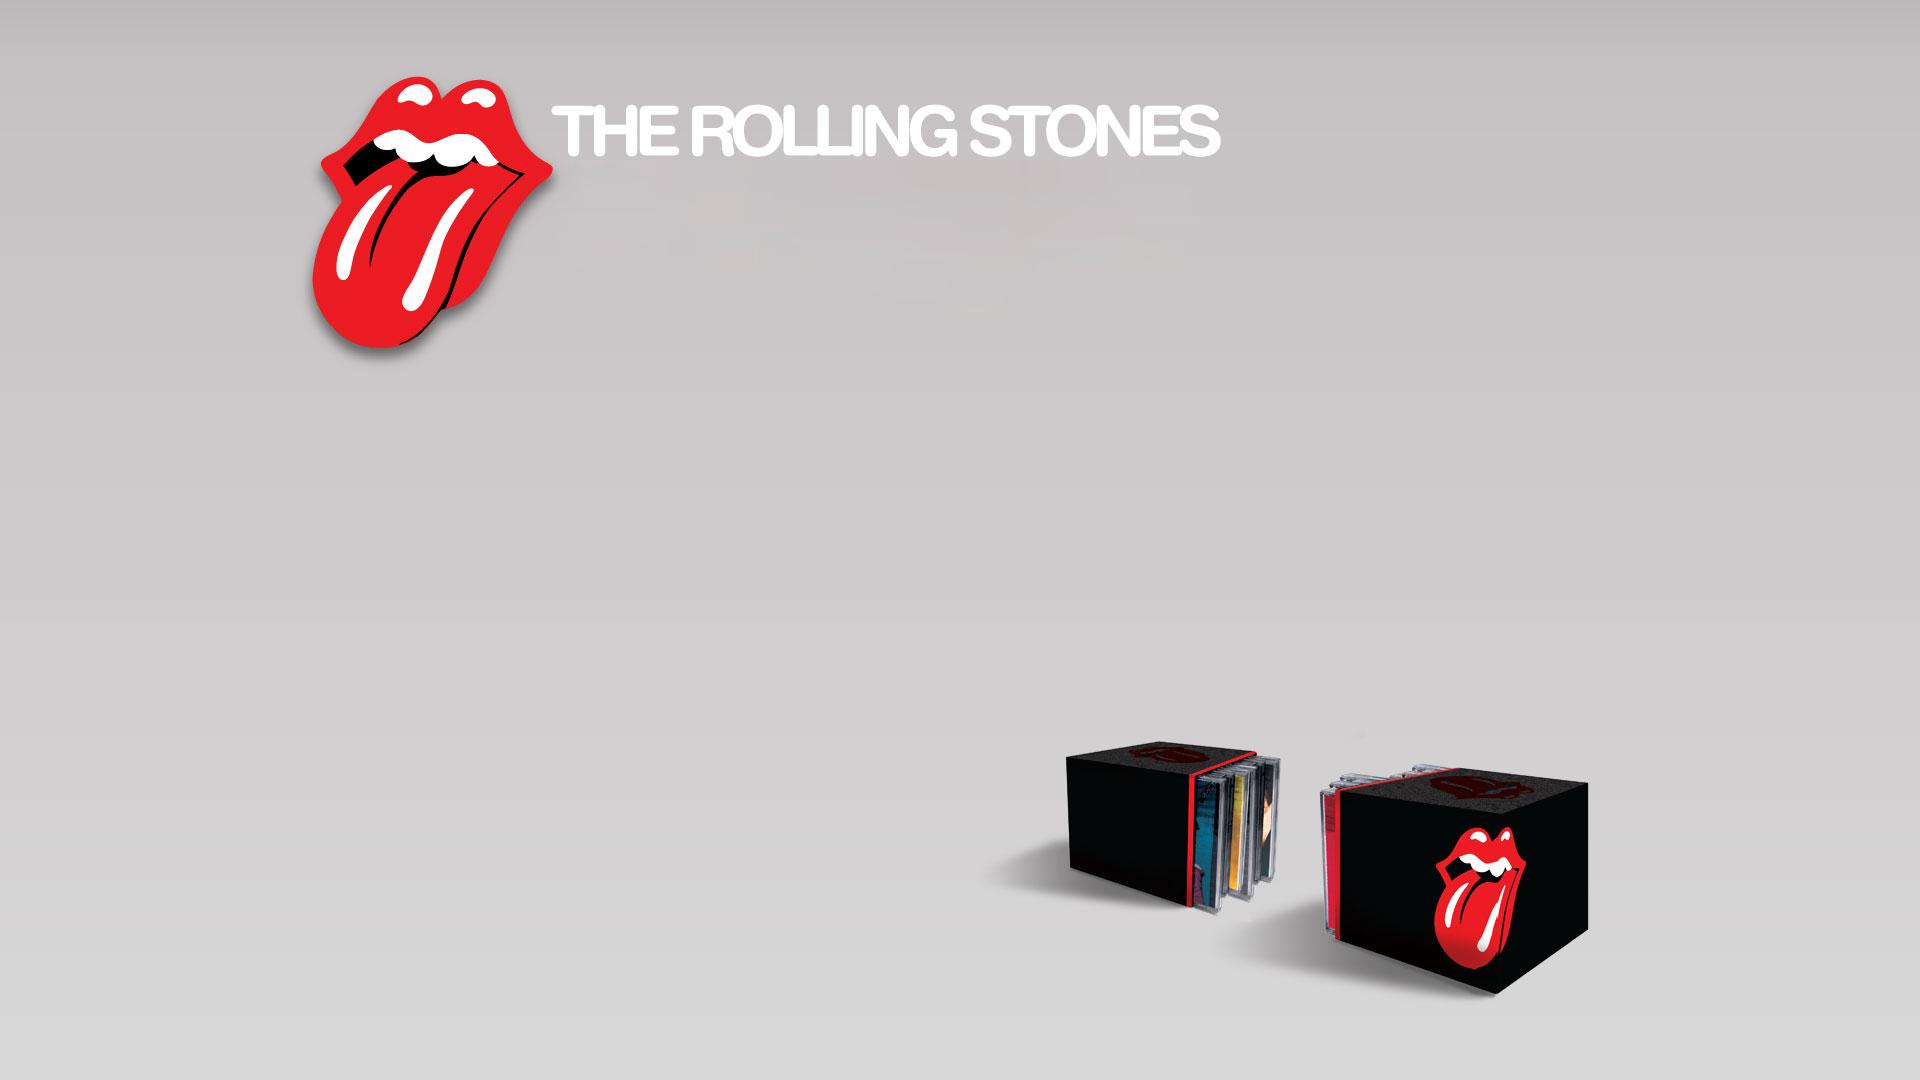 The Rolling Stones Full HD Wallpaper